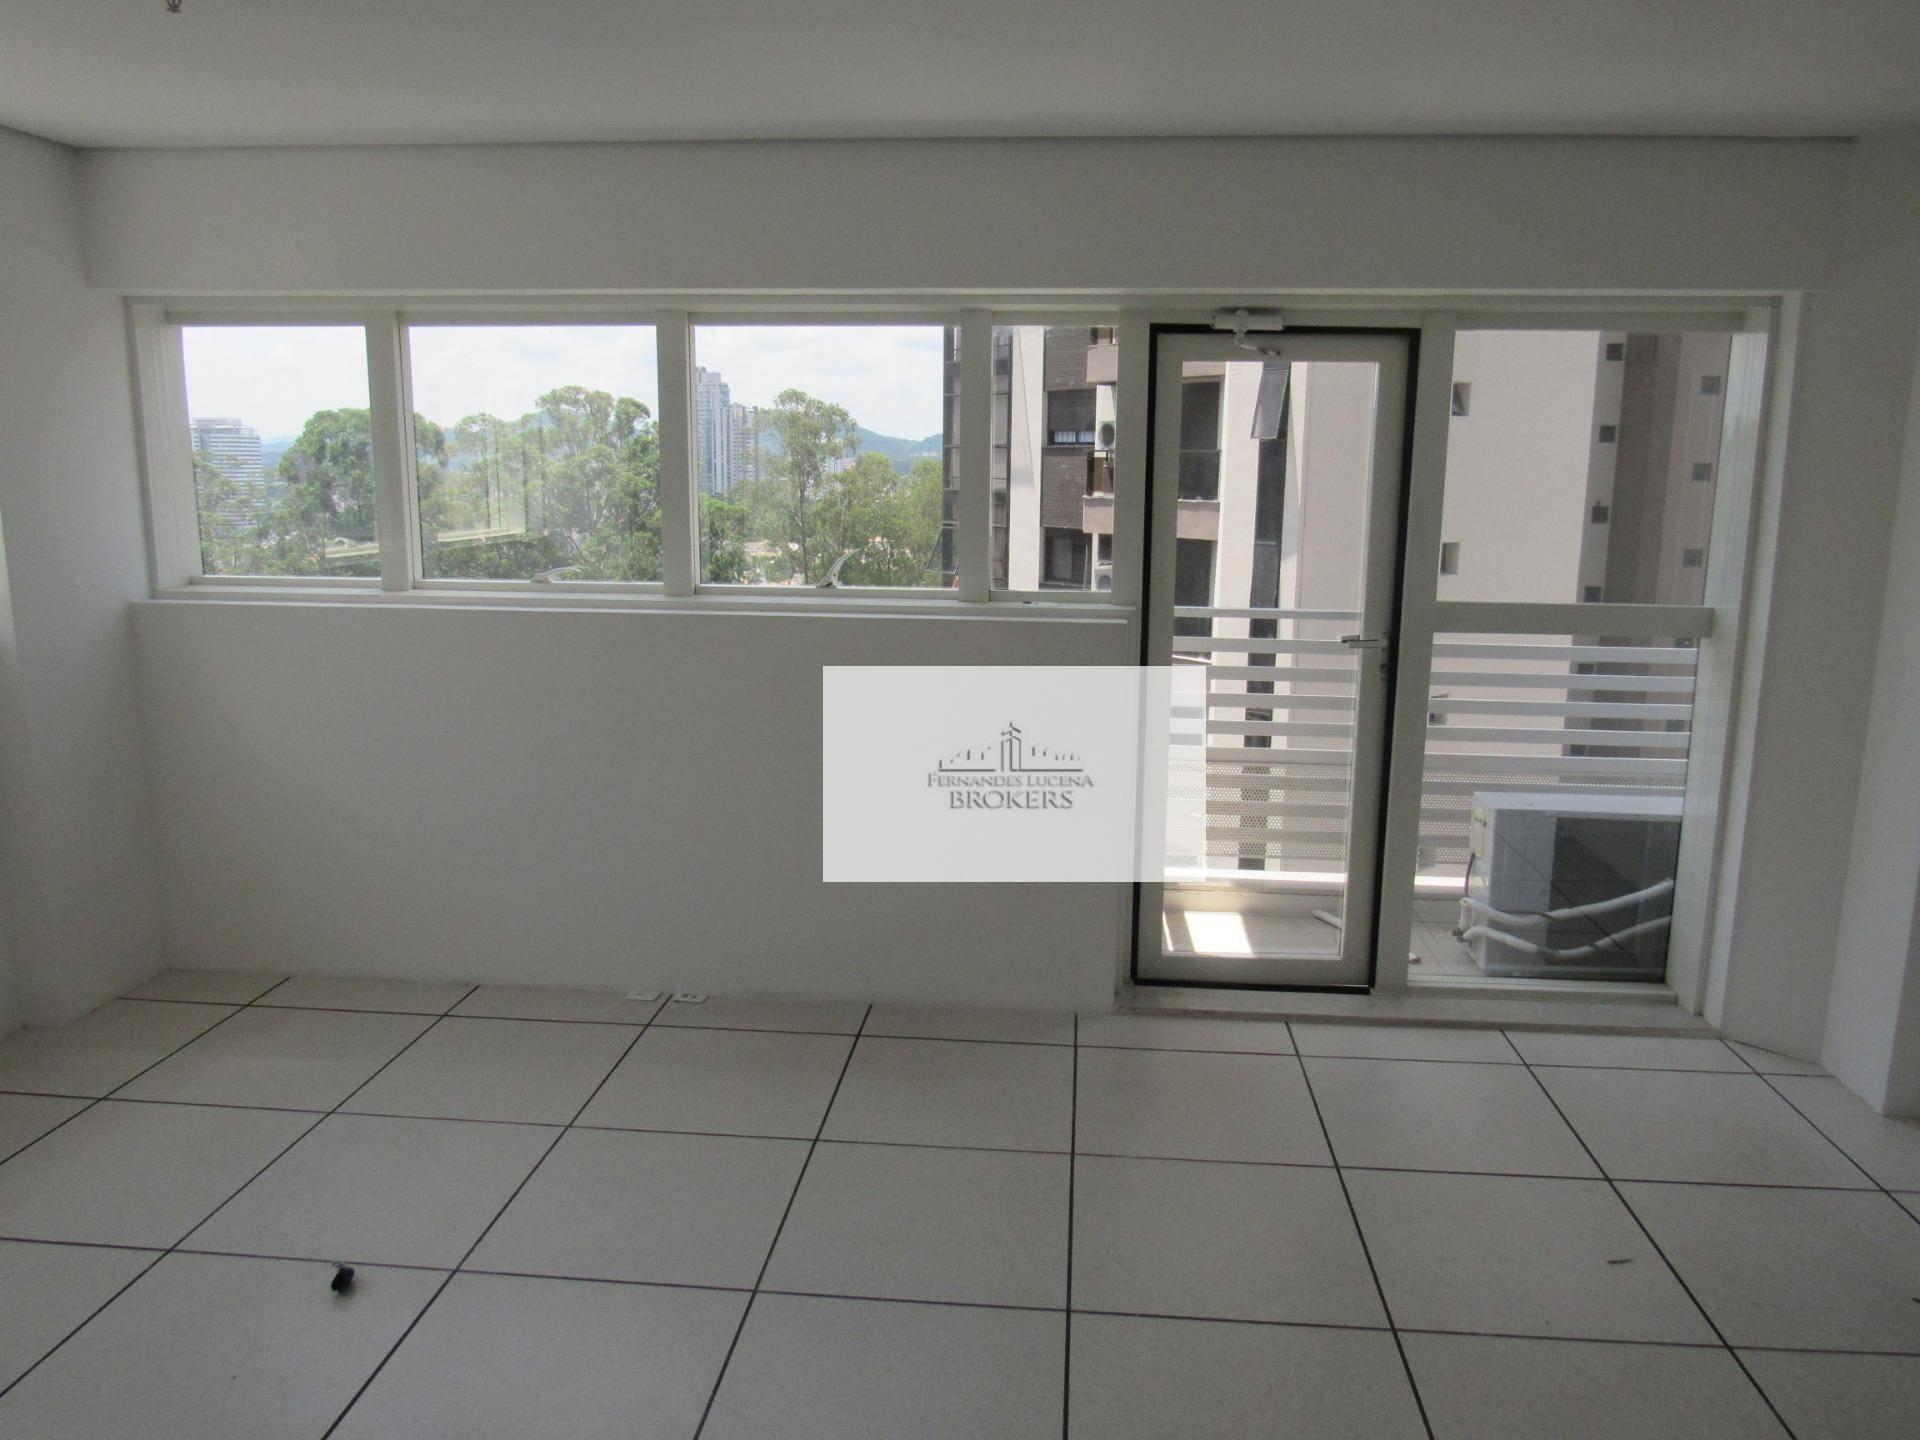 Conjunto para alugar, 31 m² por R$ 1.700/mês - Alphaville - Barueri/SP